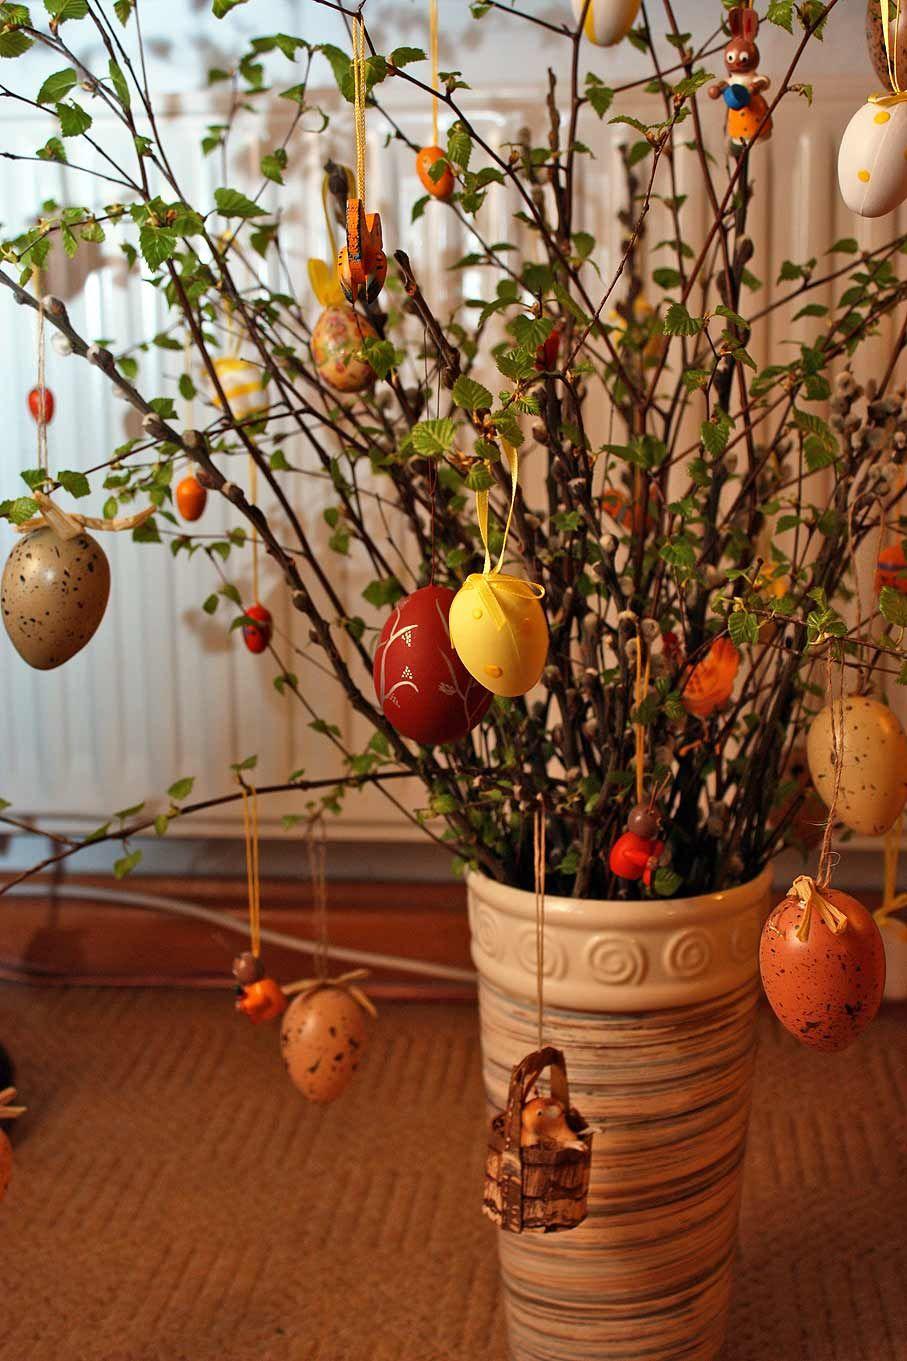 Spanish page about German Easter trees (El blog de la ...